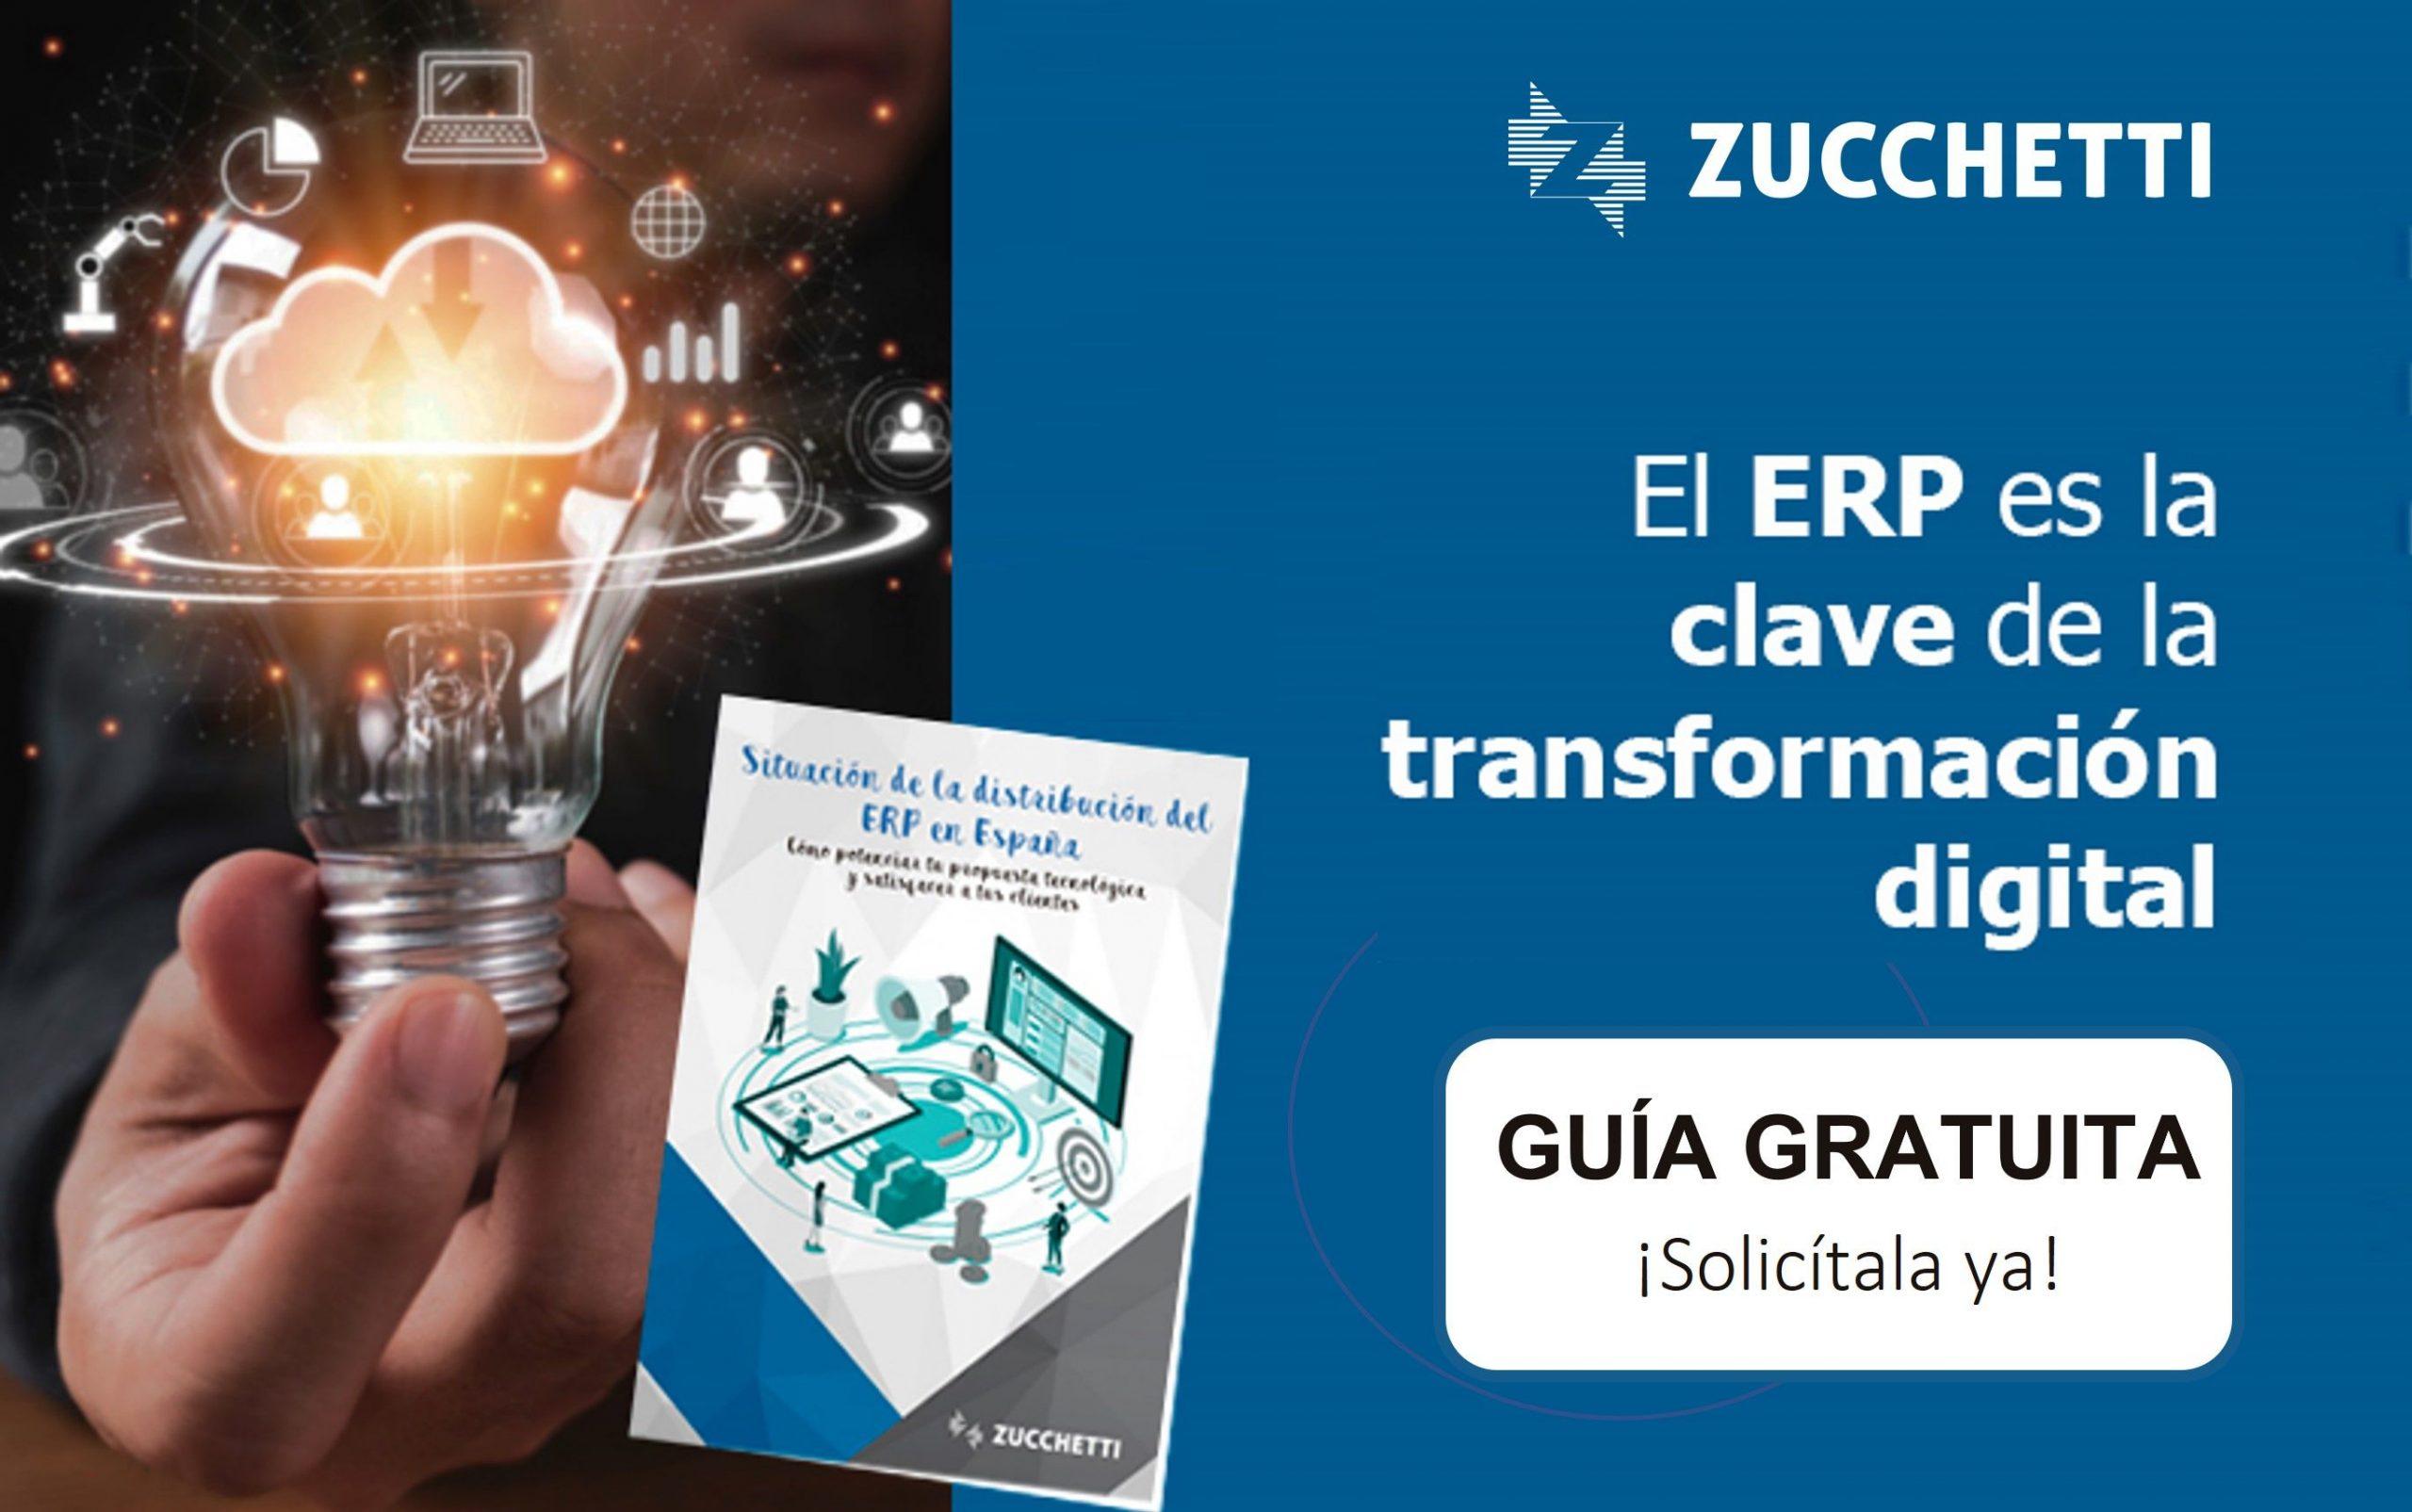 Zucchetti Spain analiza la situación del mercado de distribución ERP en España